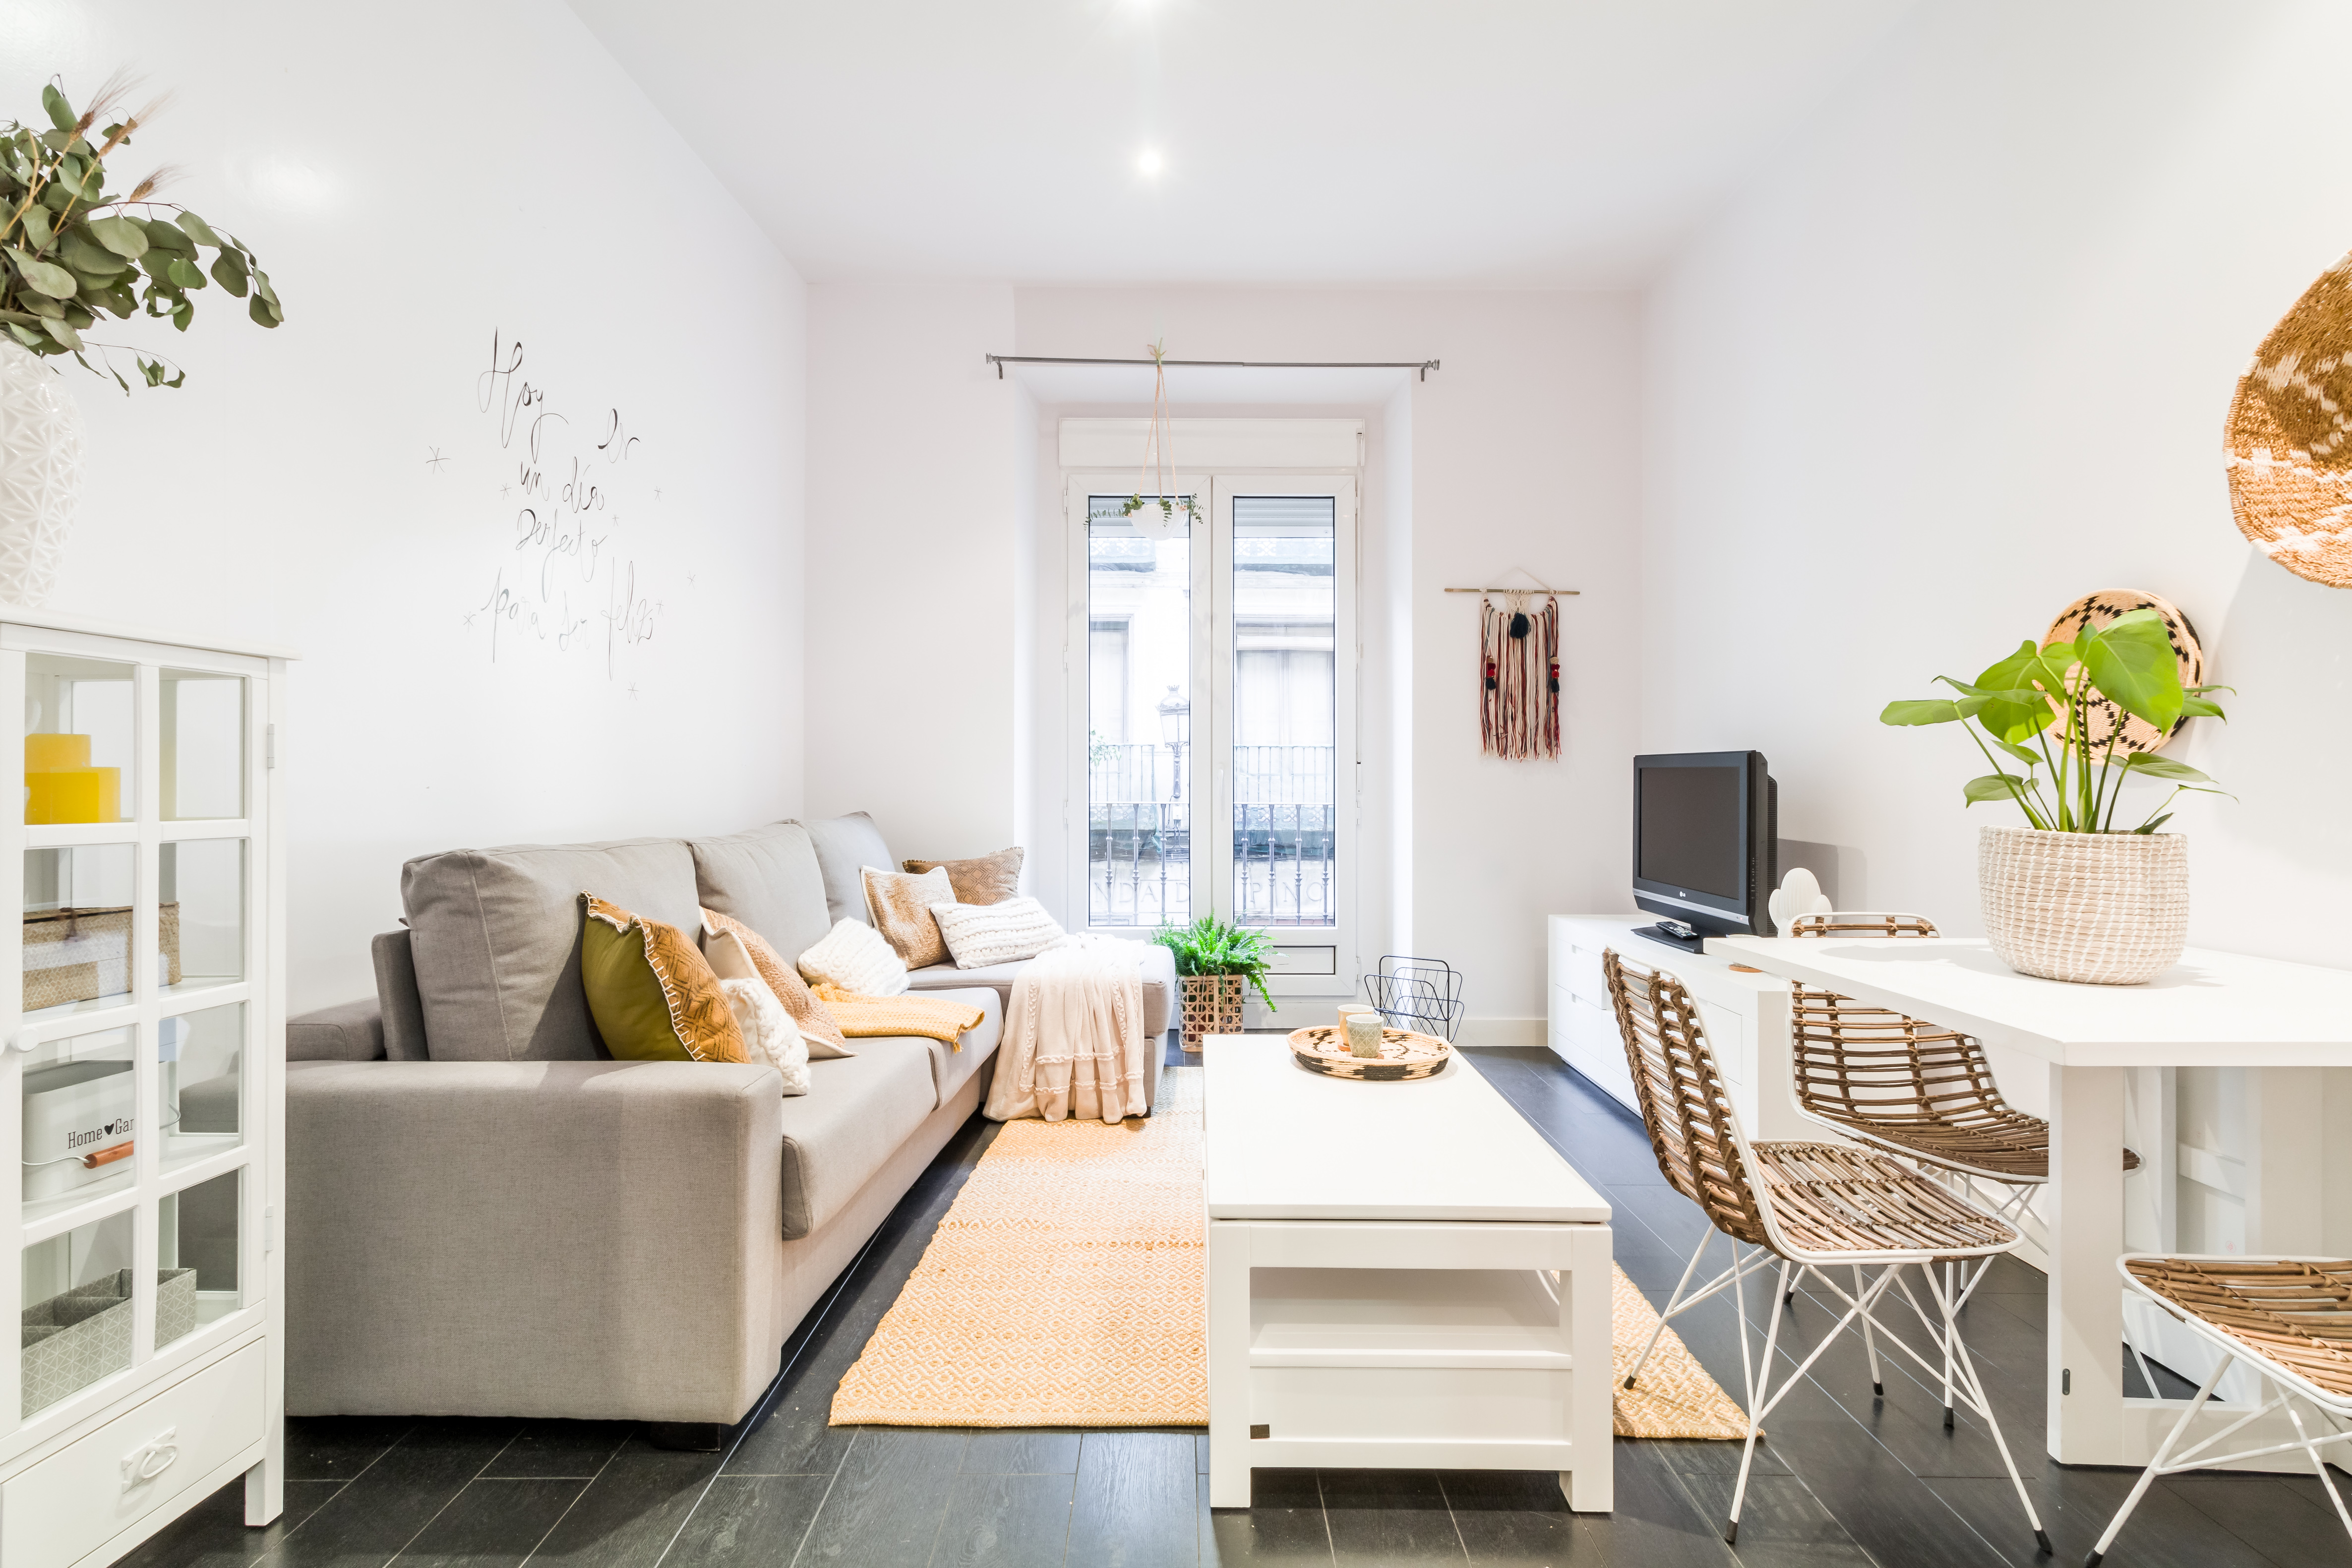 Calle Almagro, Chamberí, 1100€ - PYR Solutions